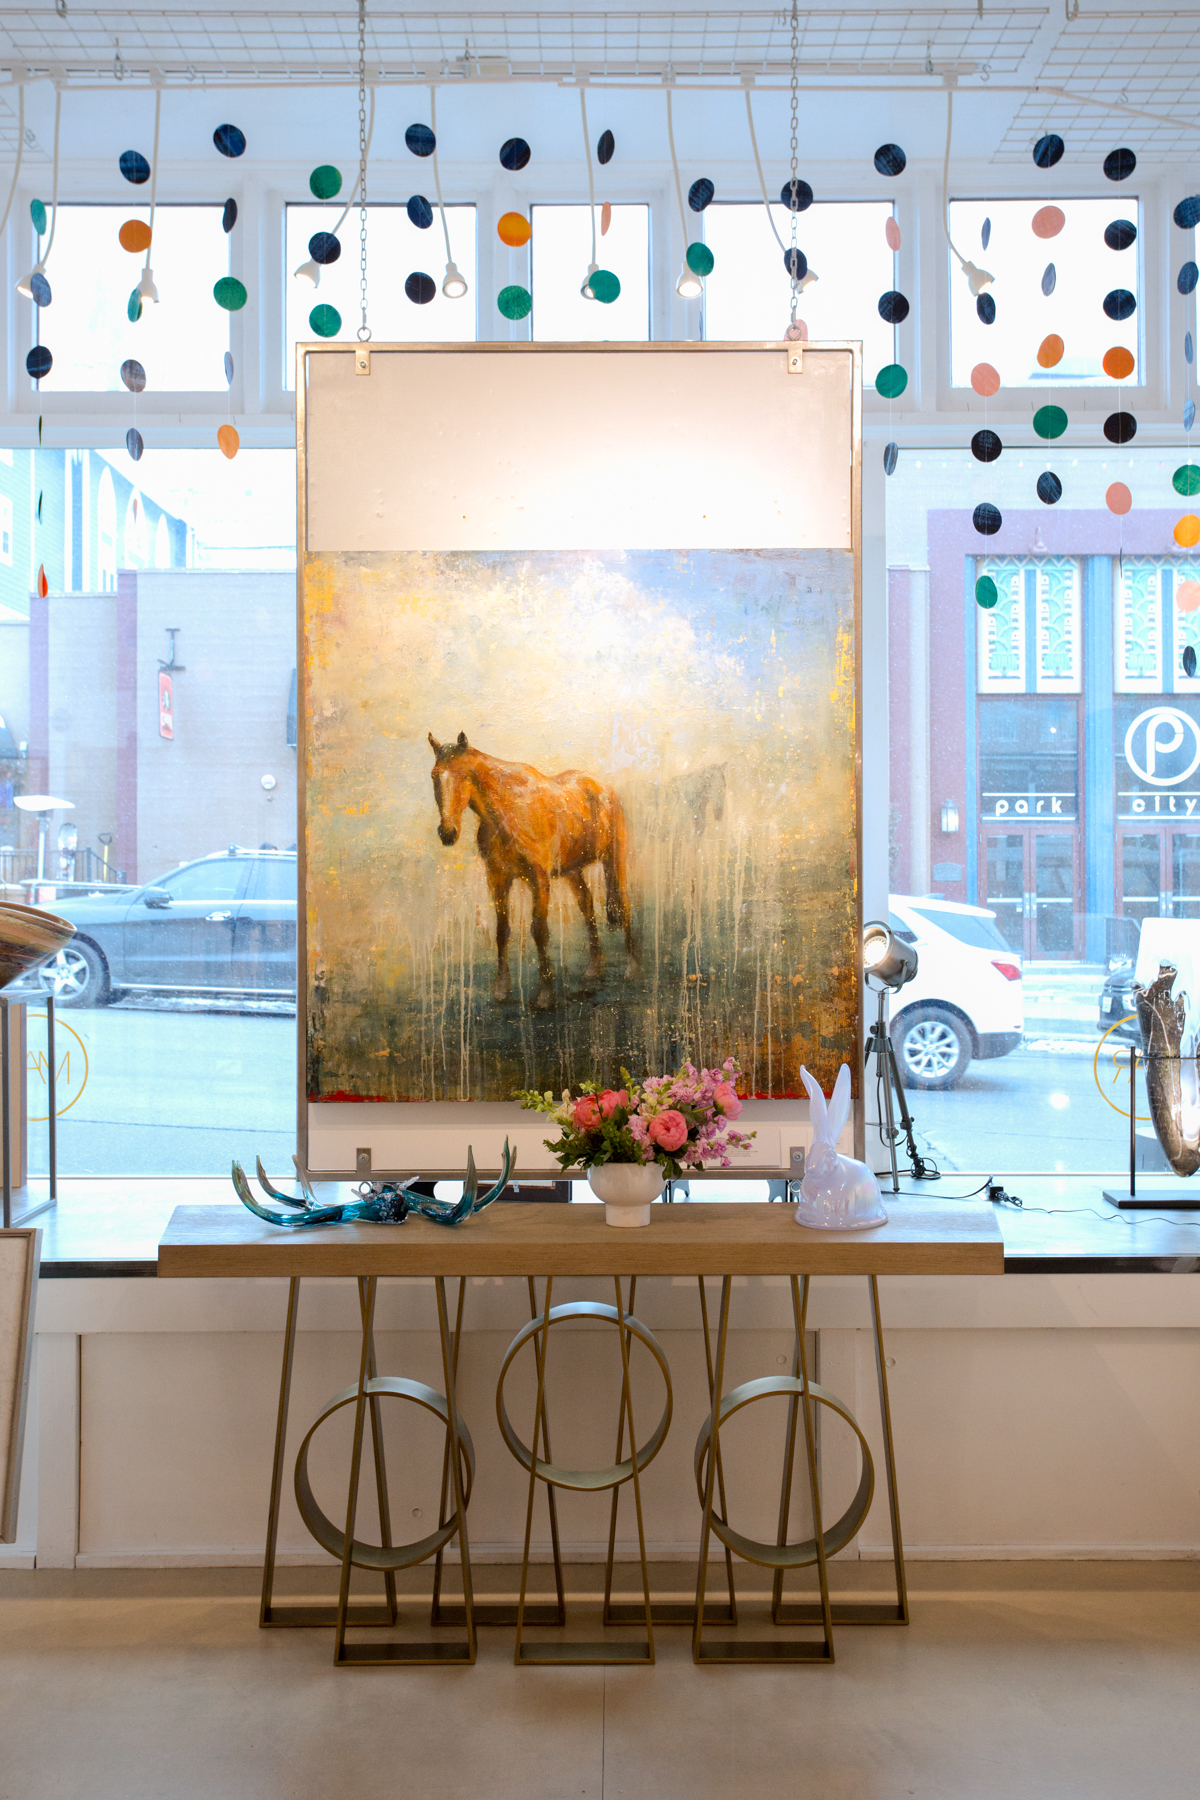 Artist Exhibition: Memento Vivere with Matt Flint